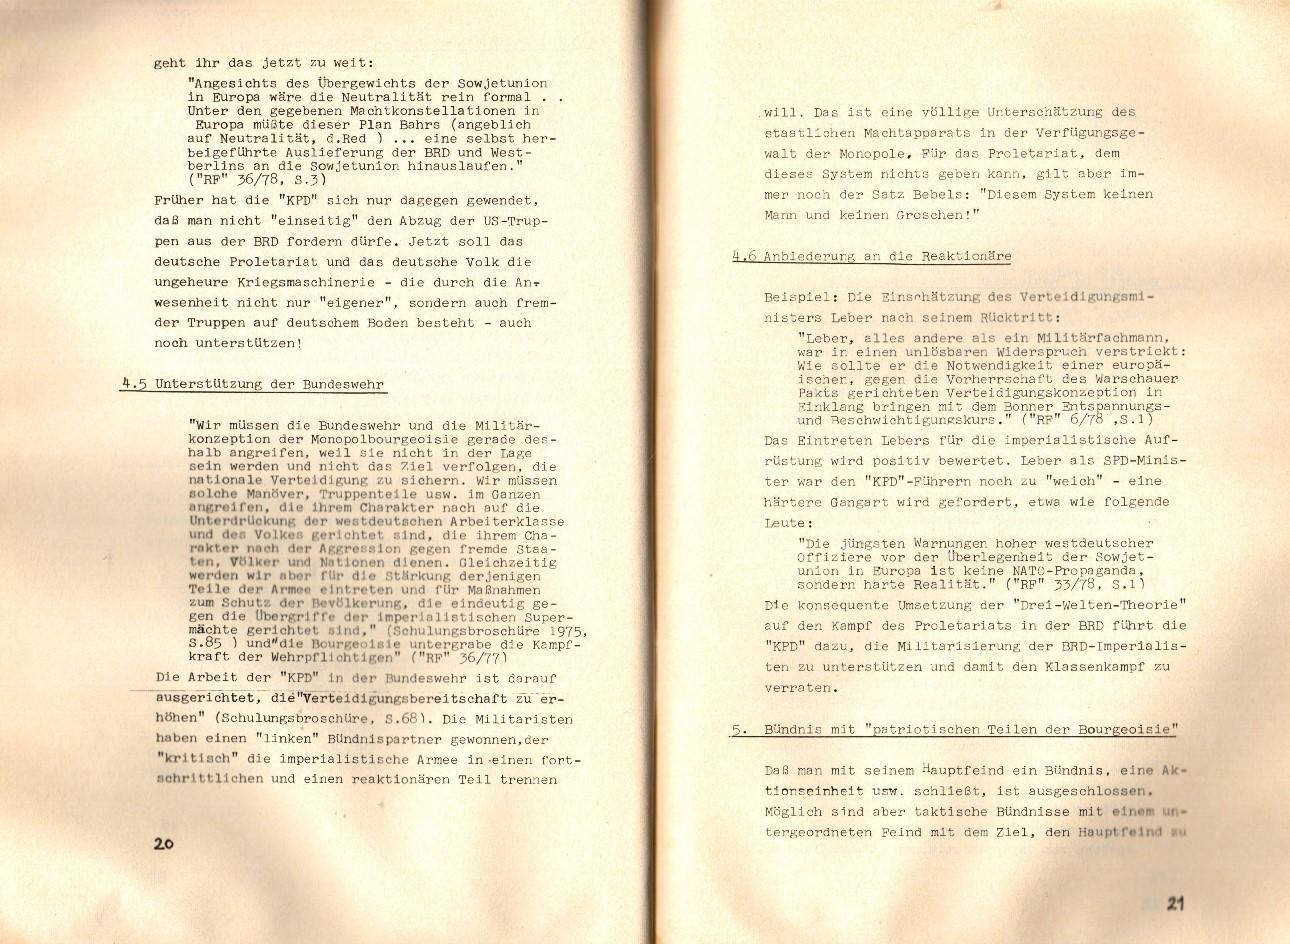 KABD_1978_Argumentationshilfen_12